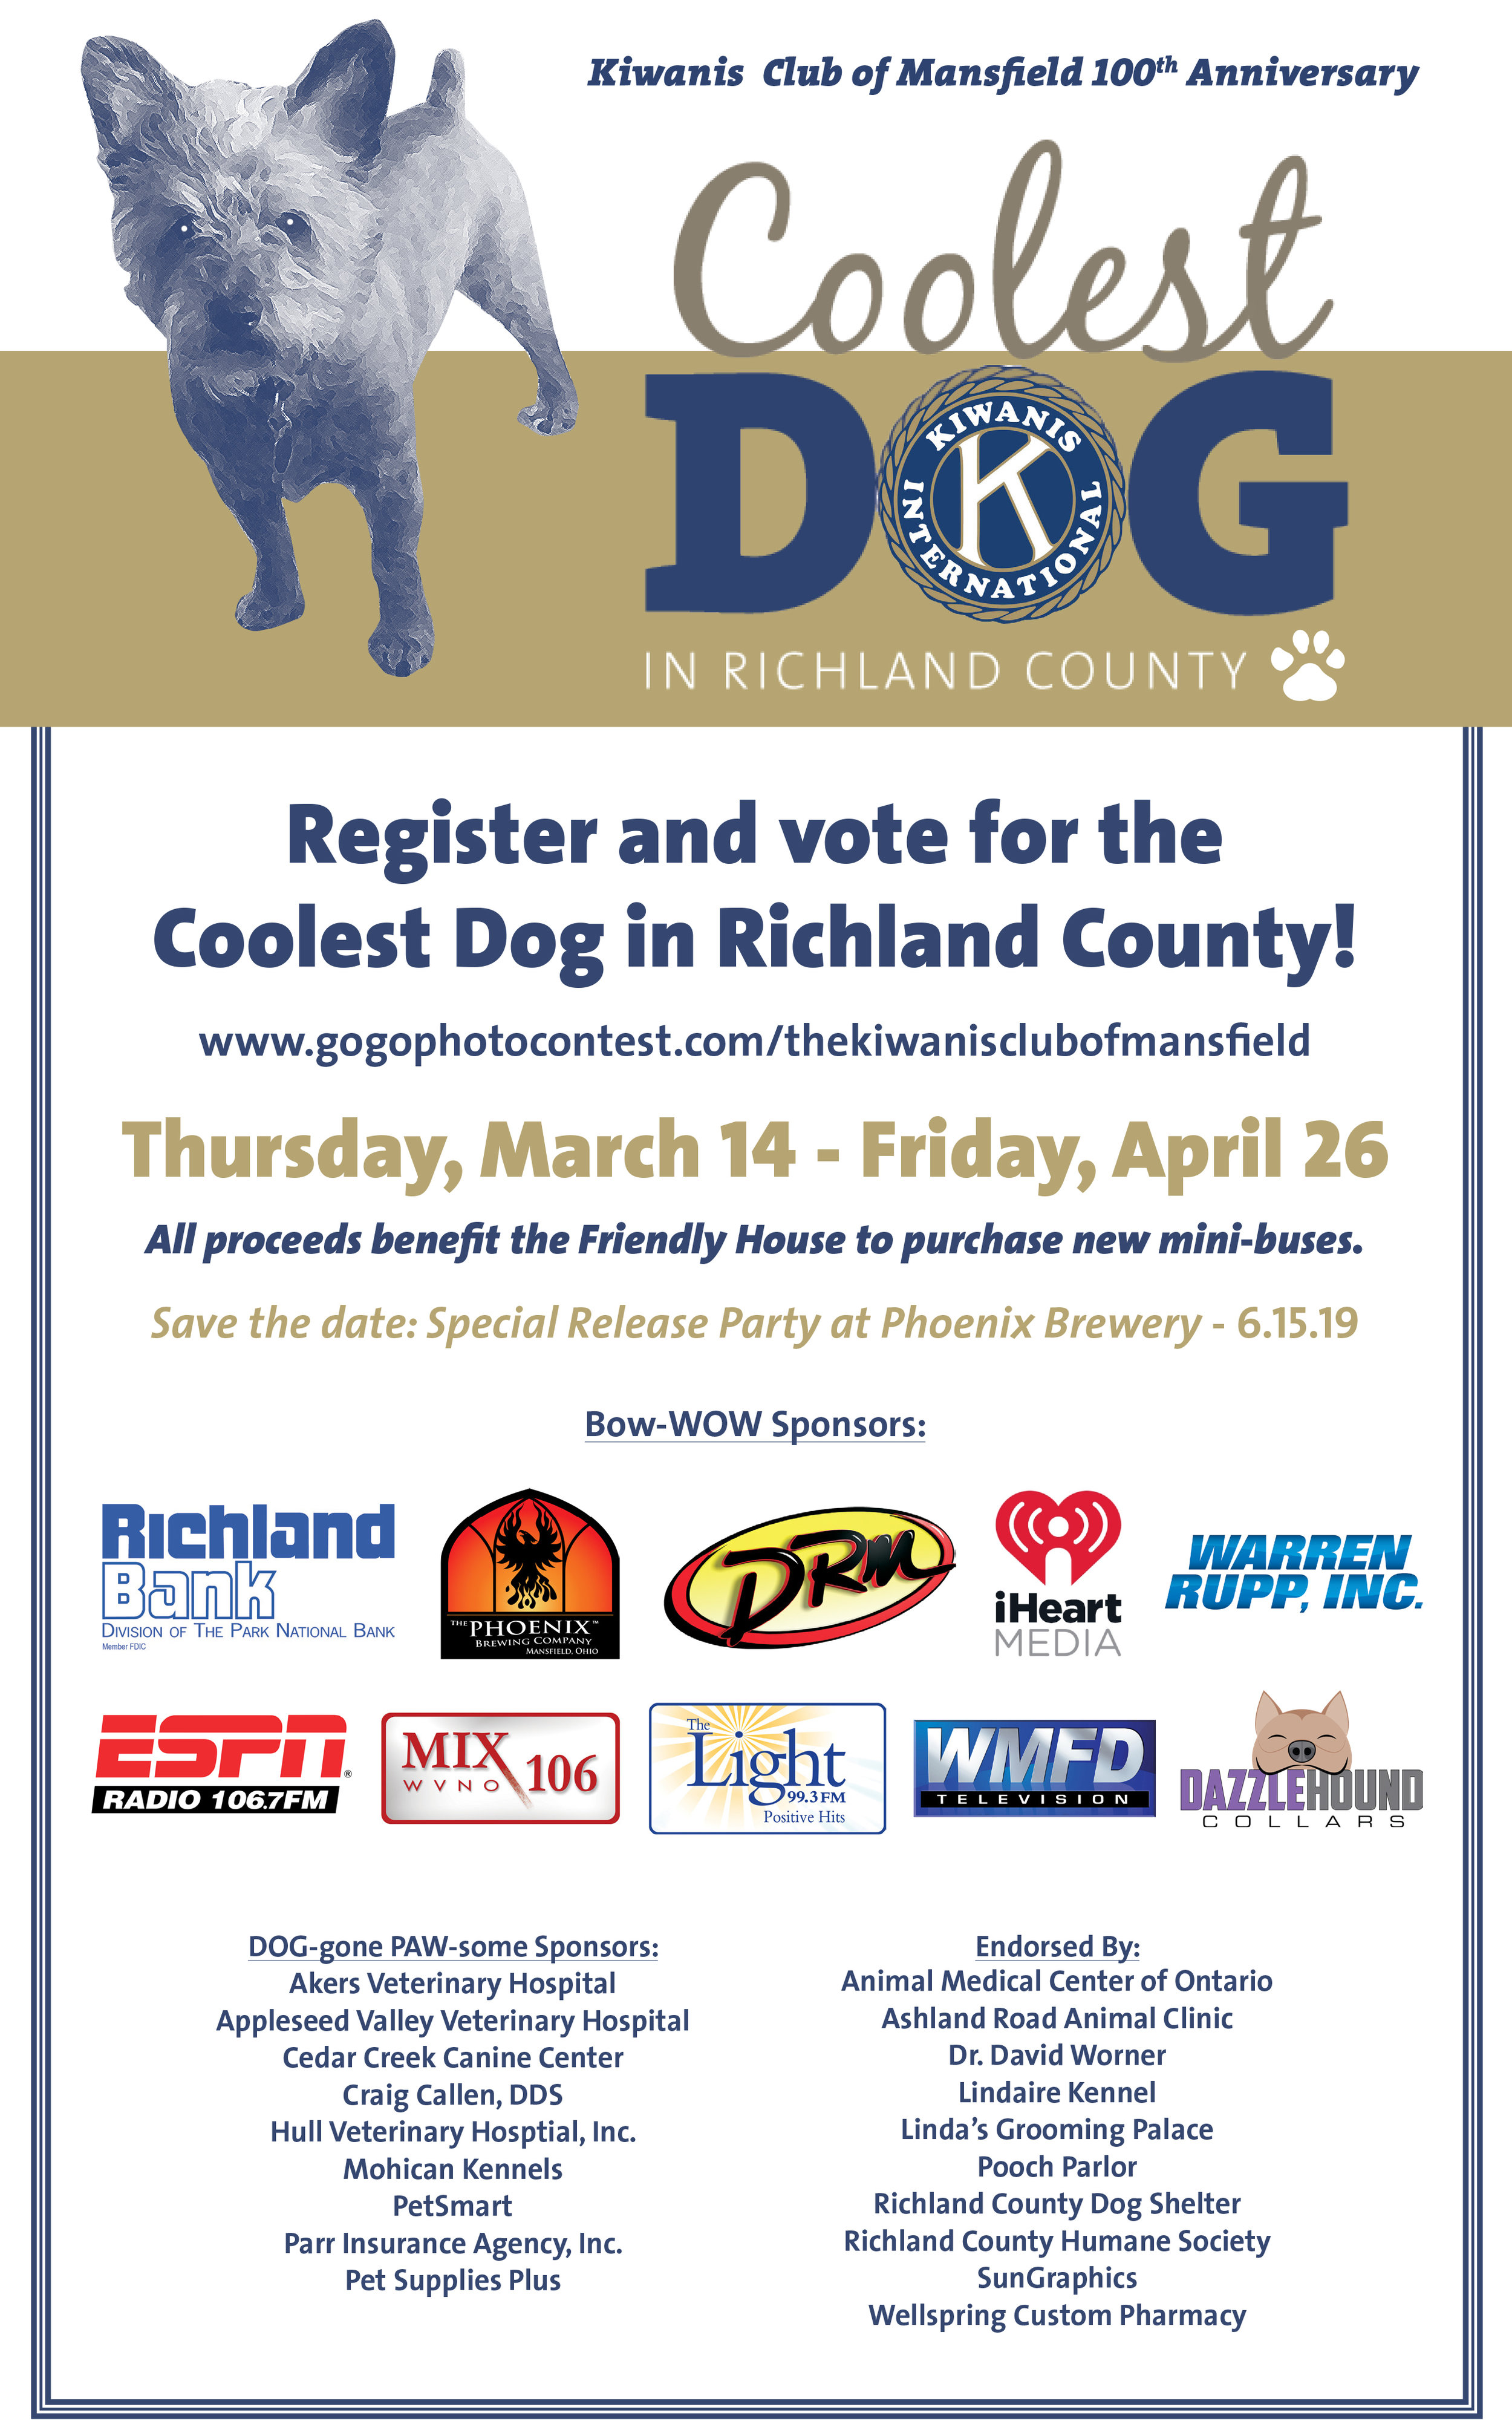 Kiwanis Coolest Dog Flyer Legal (002).jpg